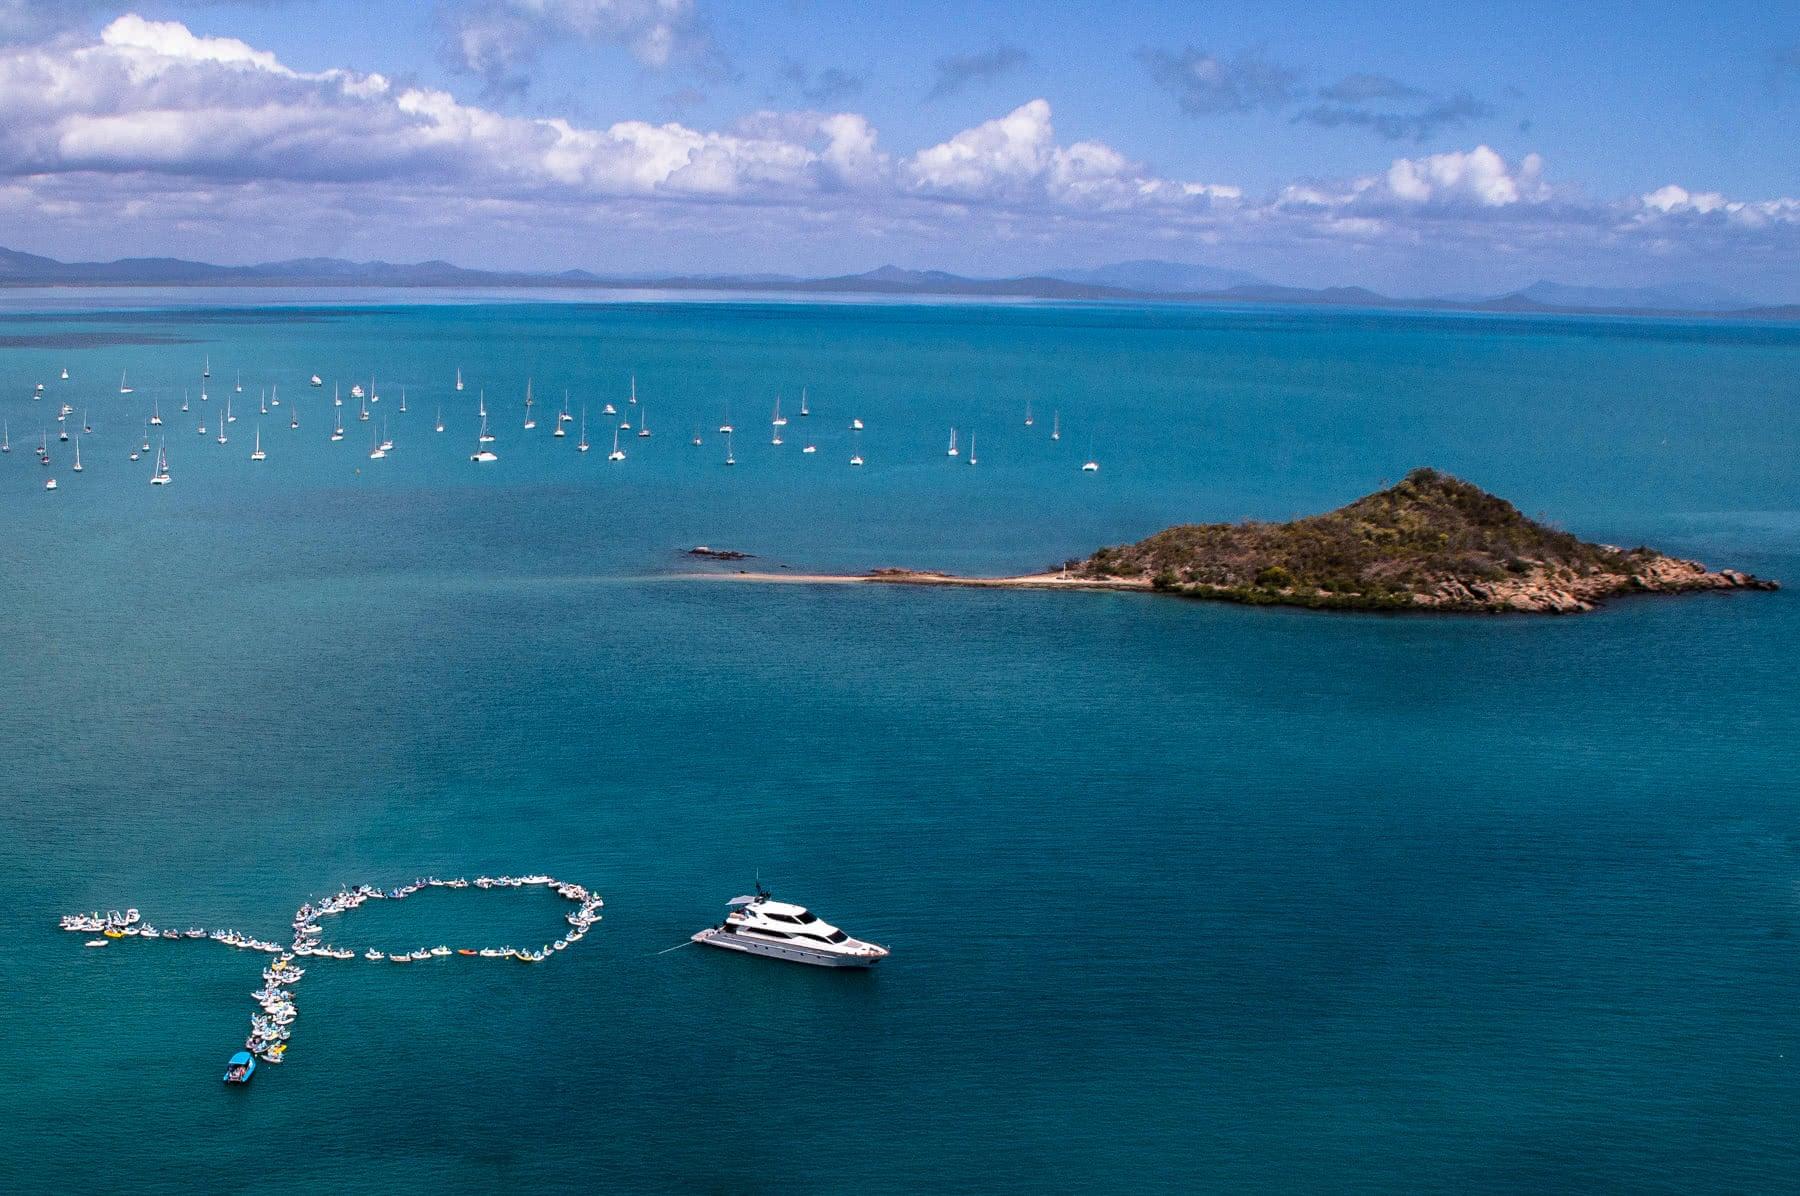 Shag Islet Cruising Yacht Club rendezvous 2016